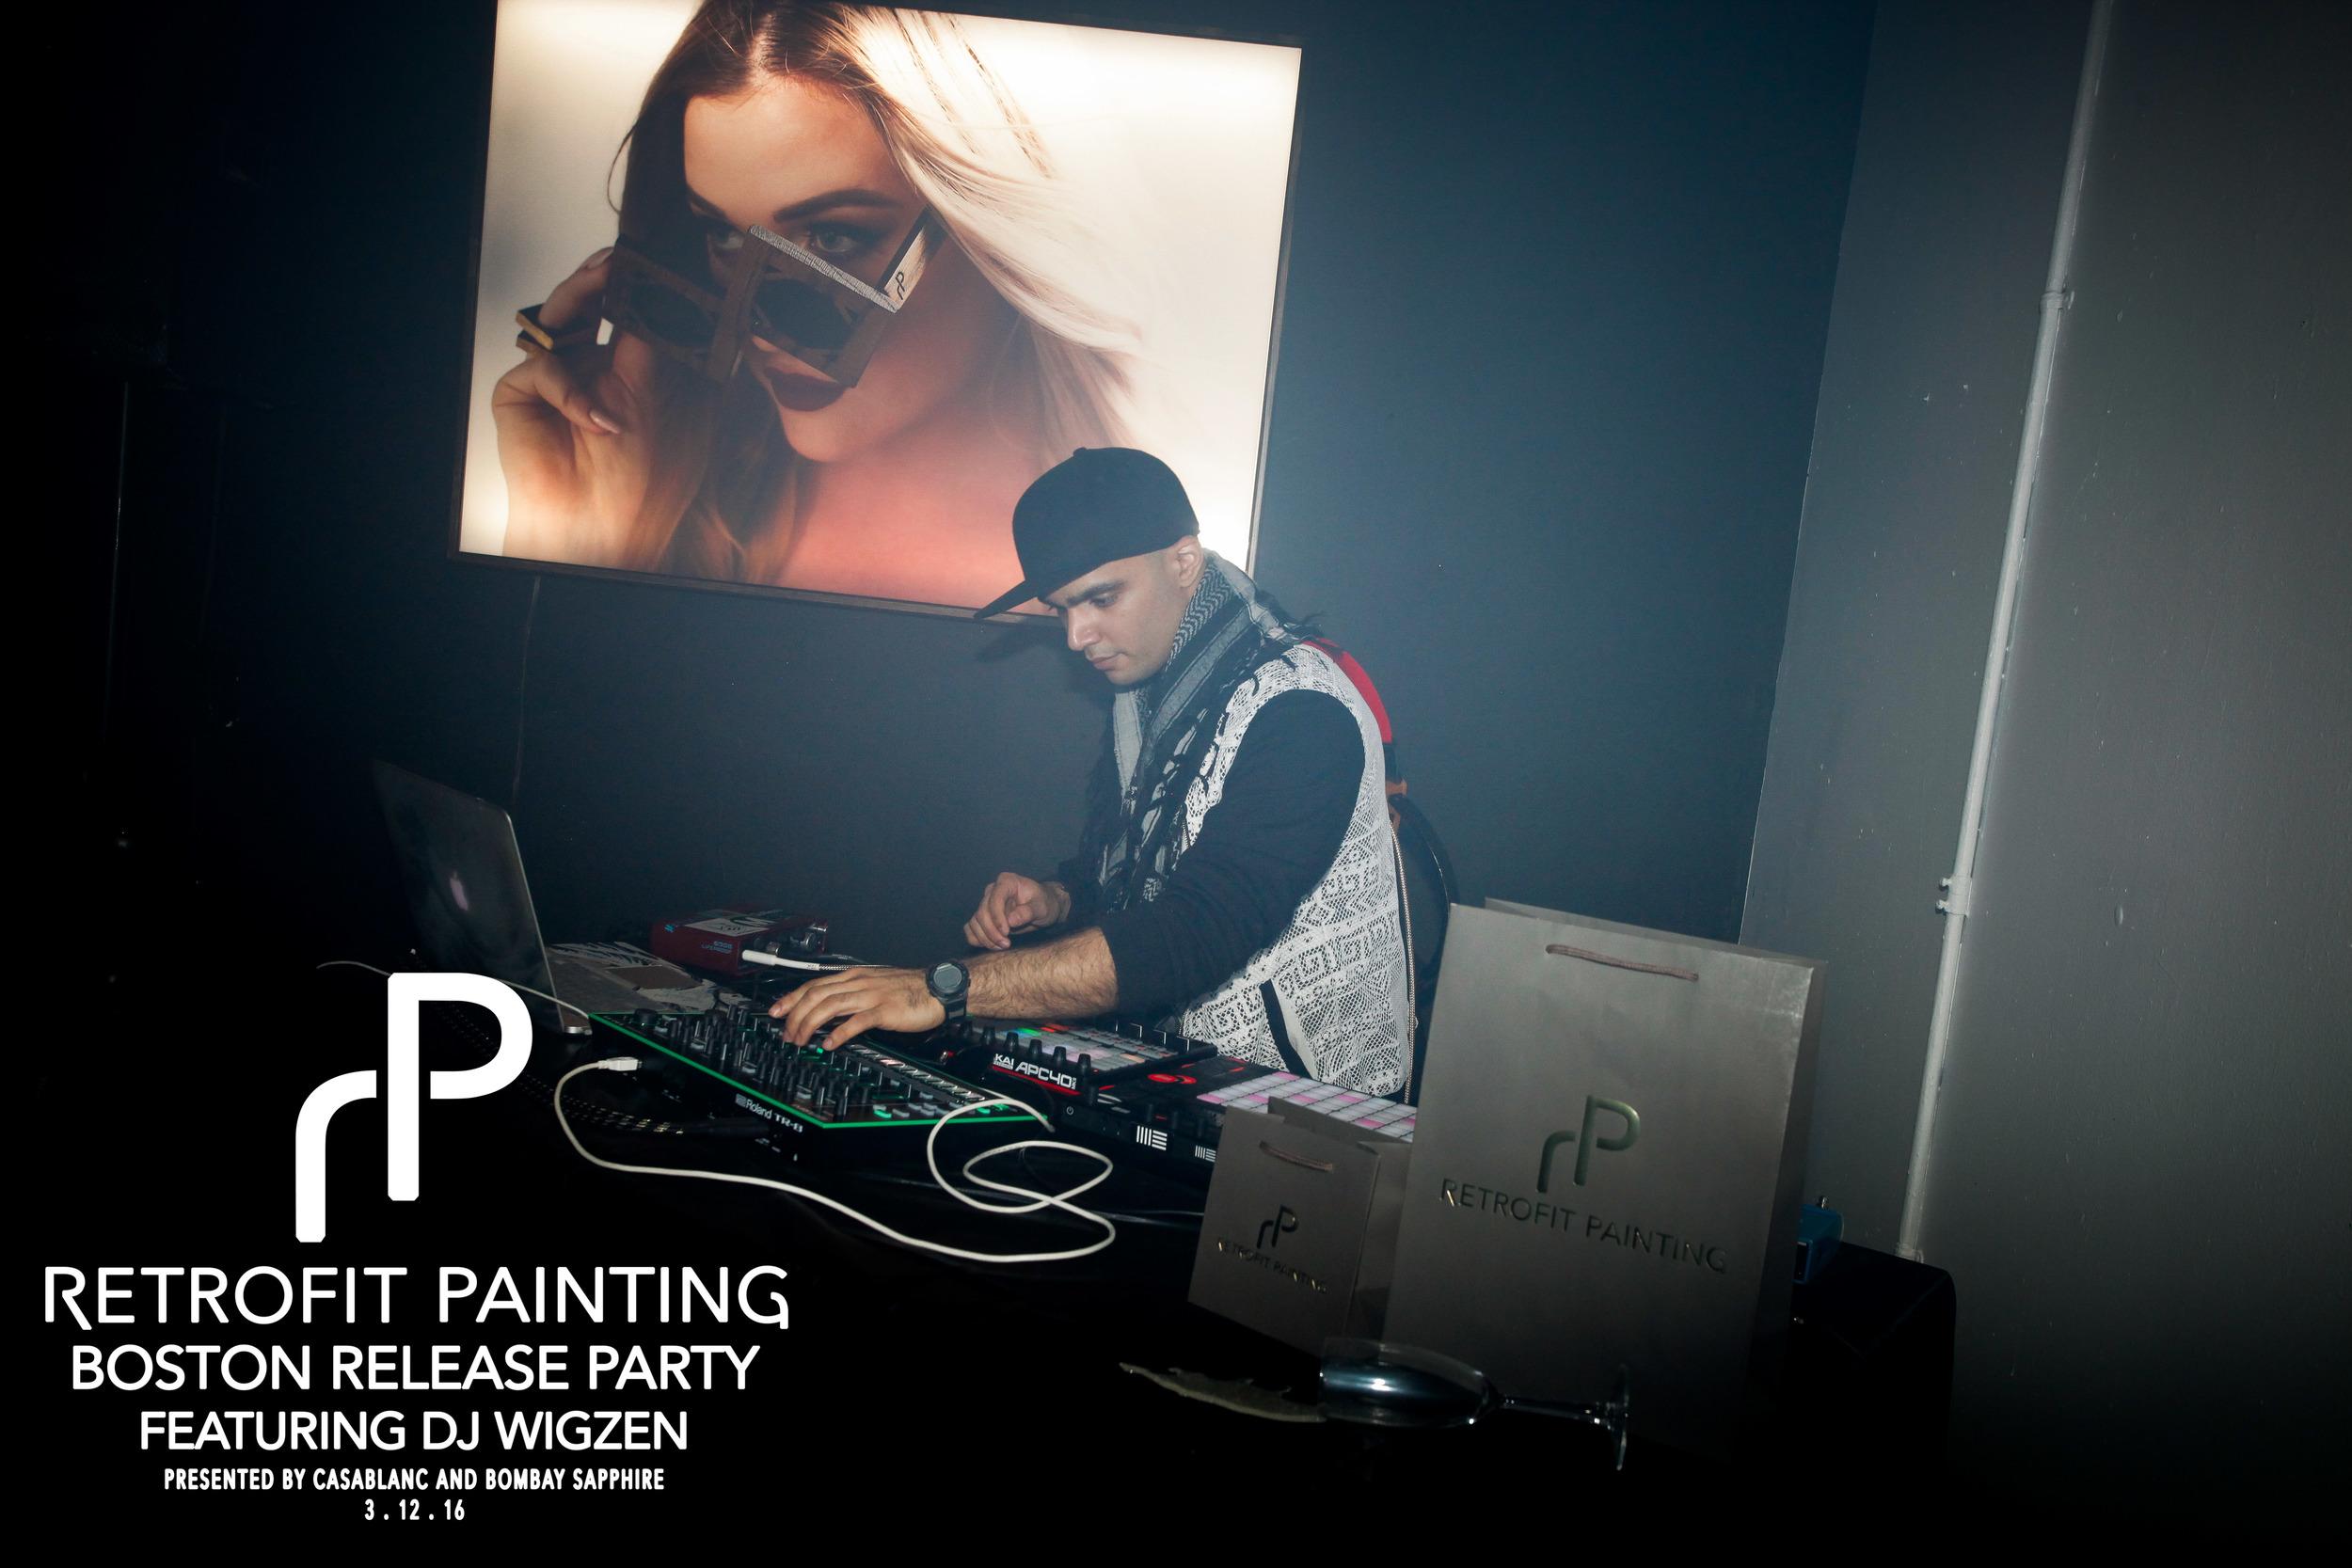 Retrofit Painting Boston Release Party 0025.jpg